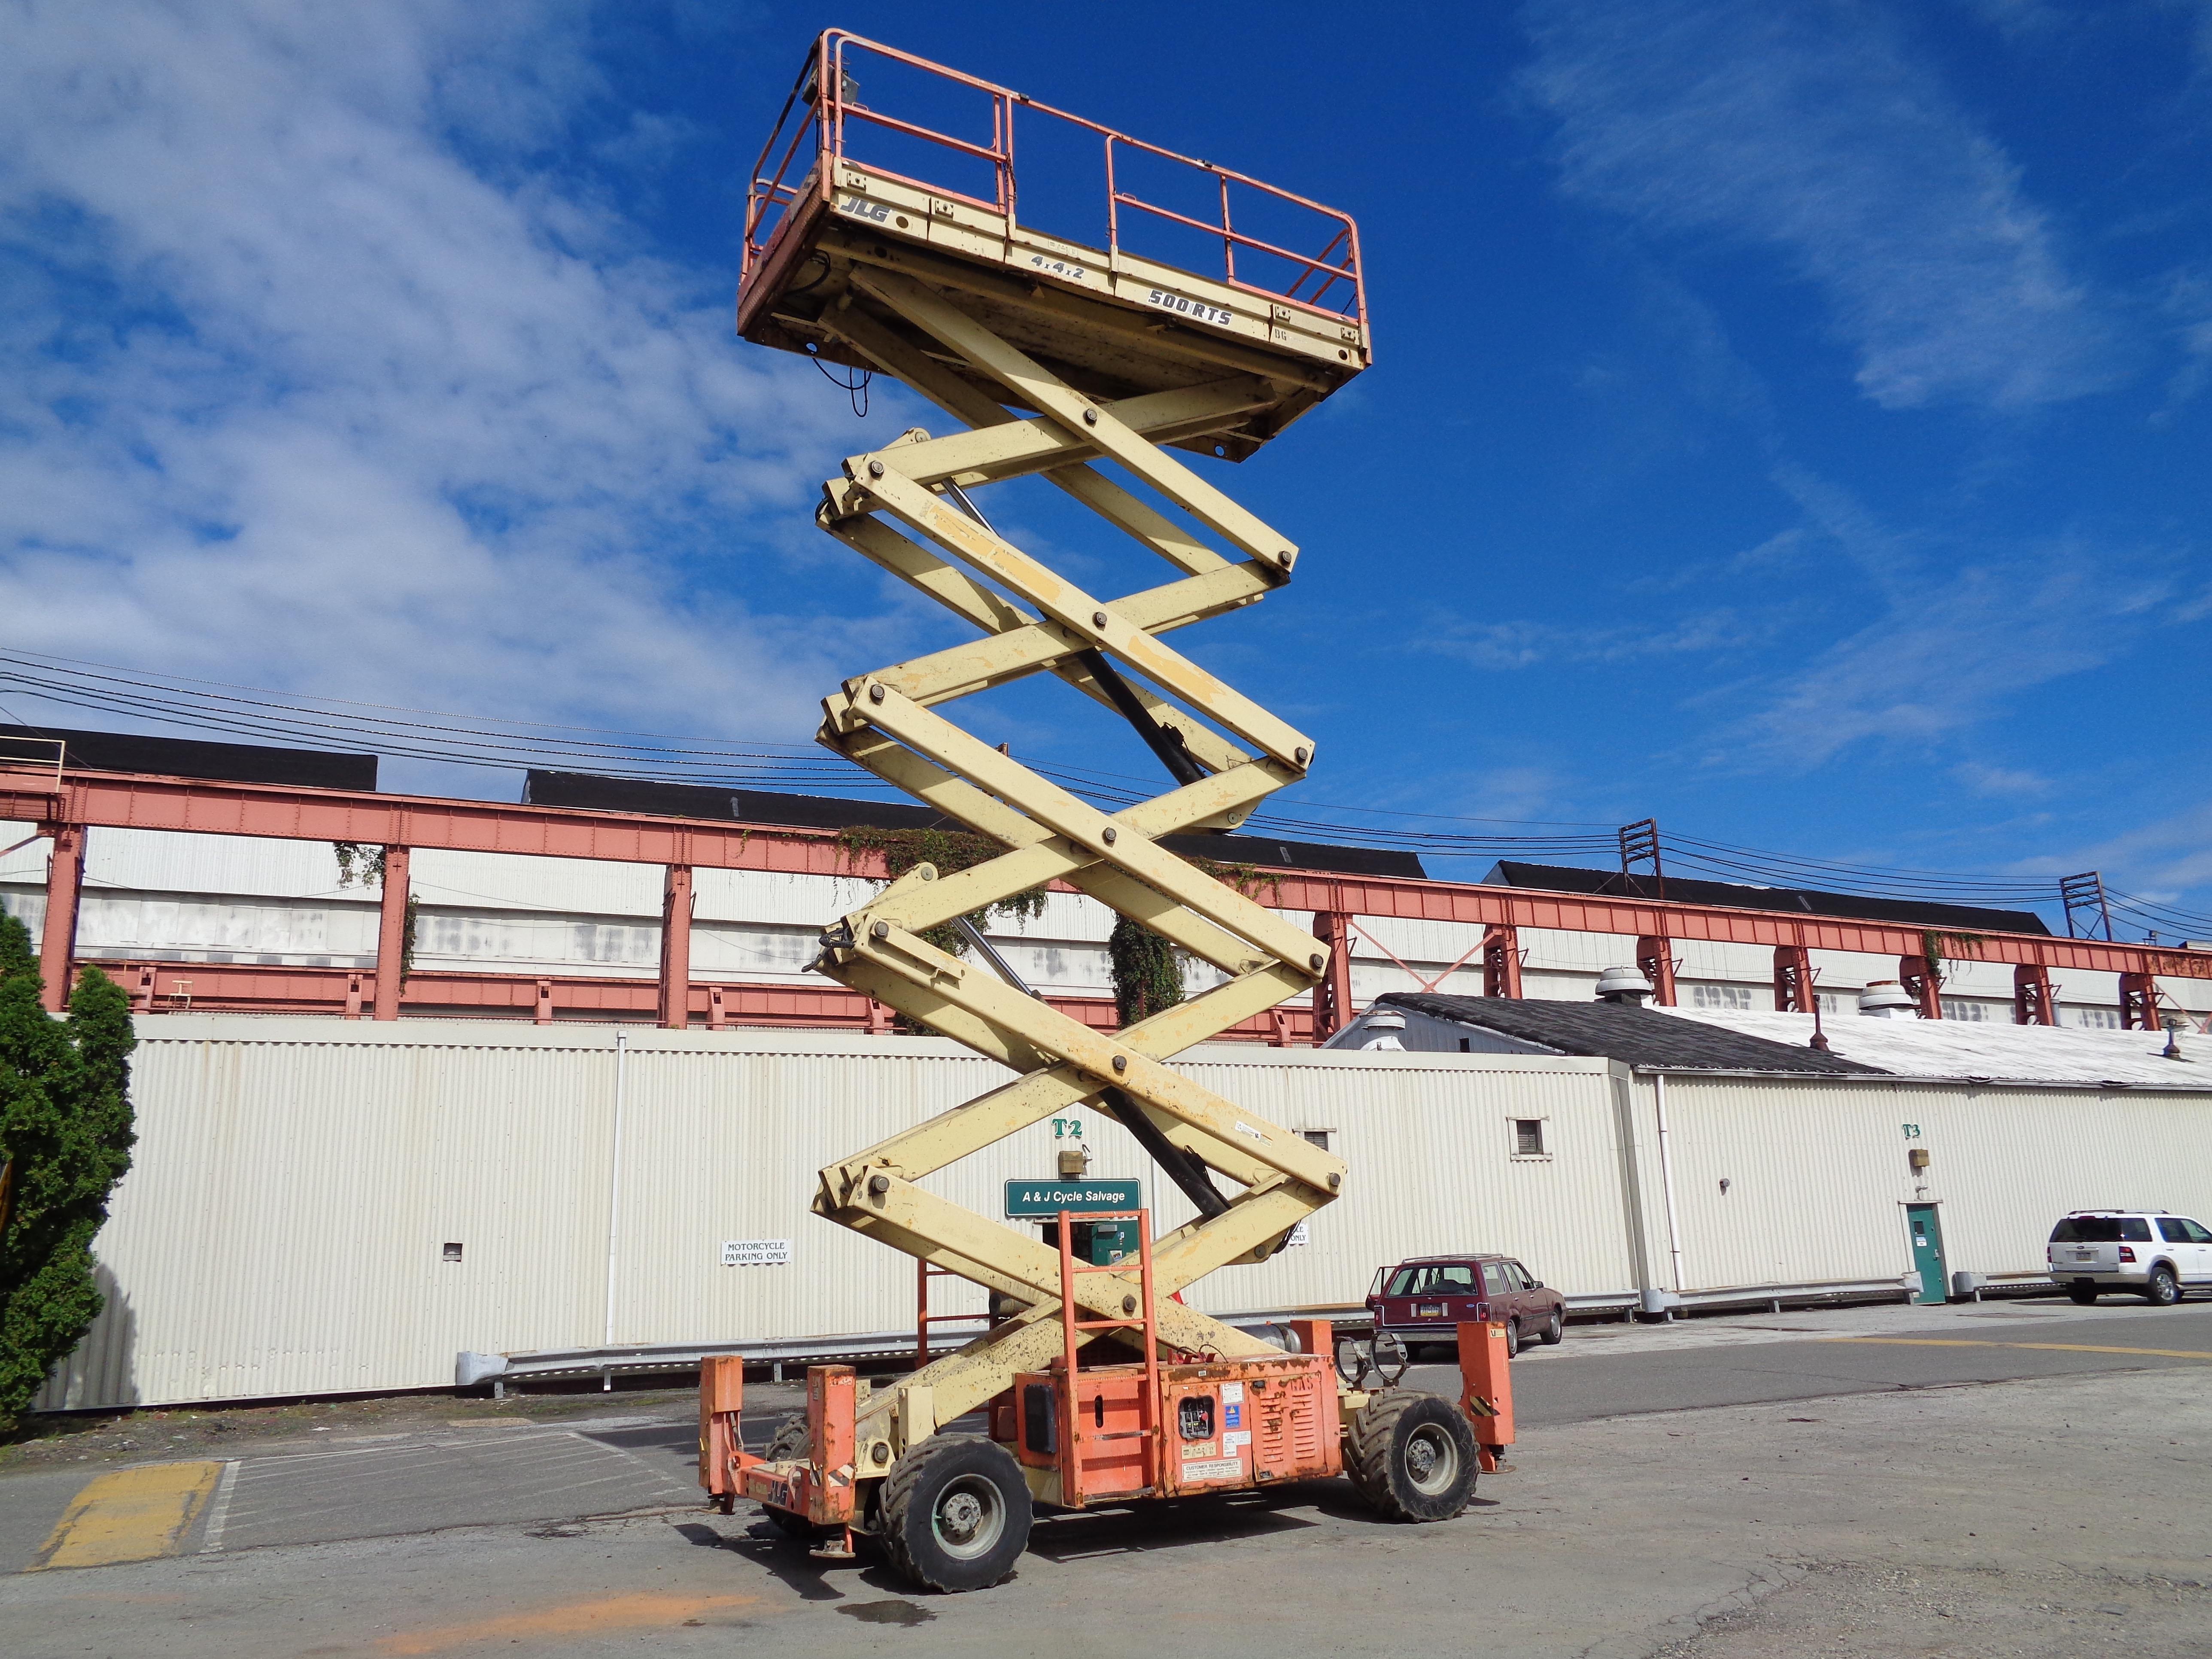 Lot 48 - JLG 500RTS Rough Terrain 4x4 Scissor Lift - 50Ft Height